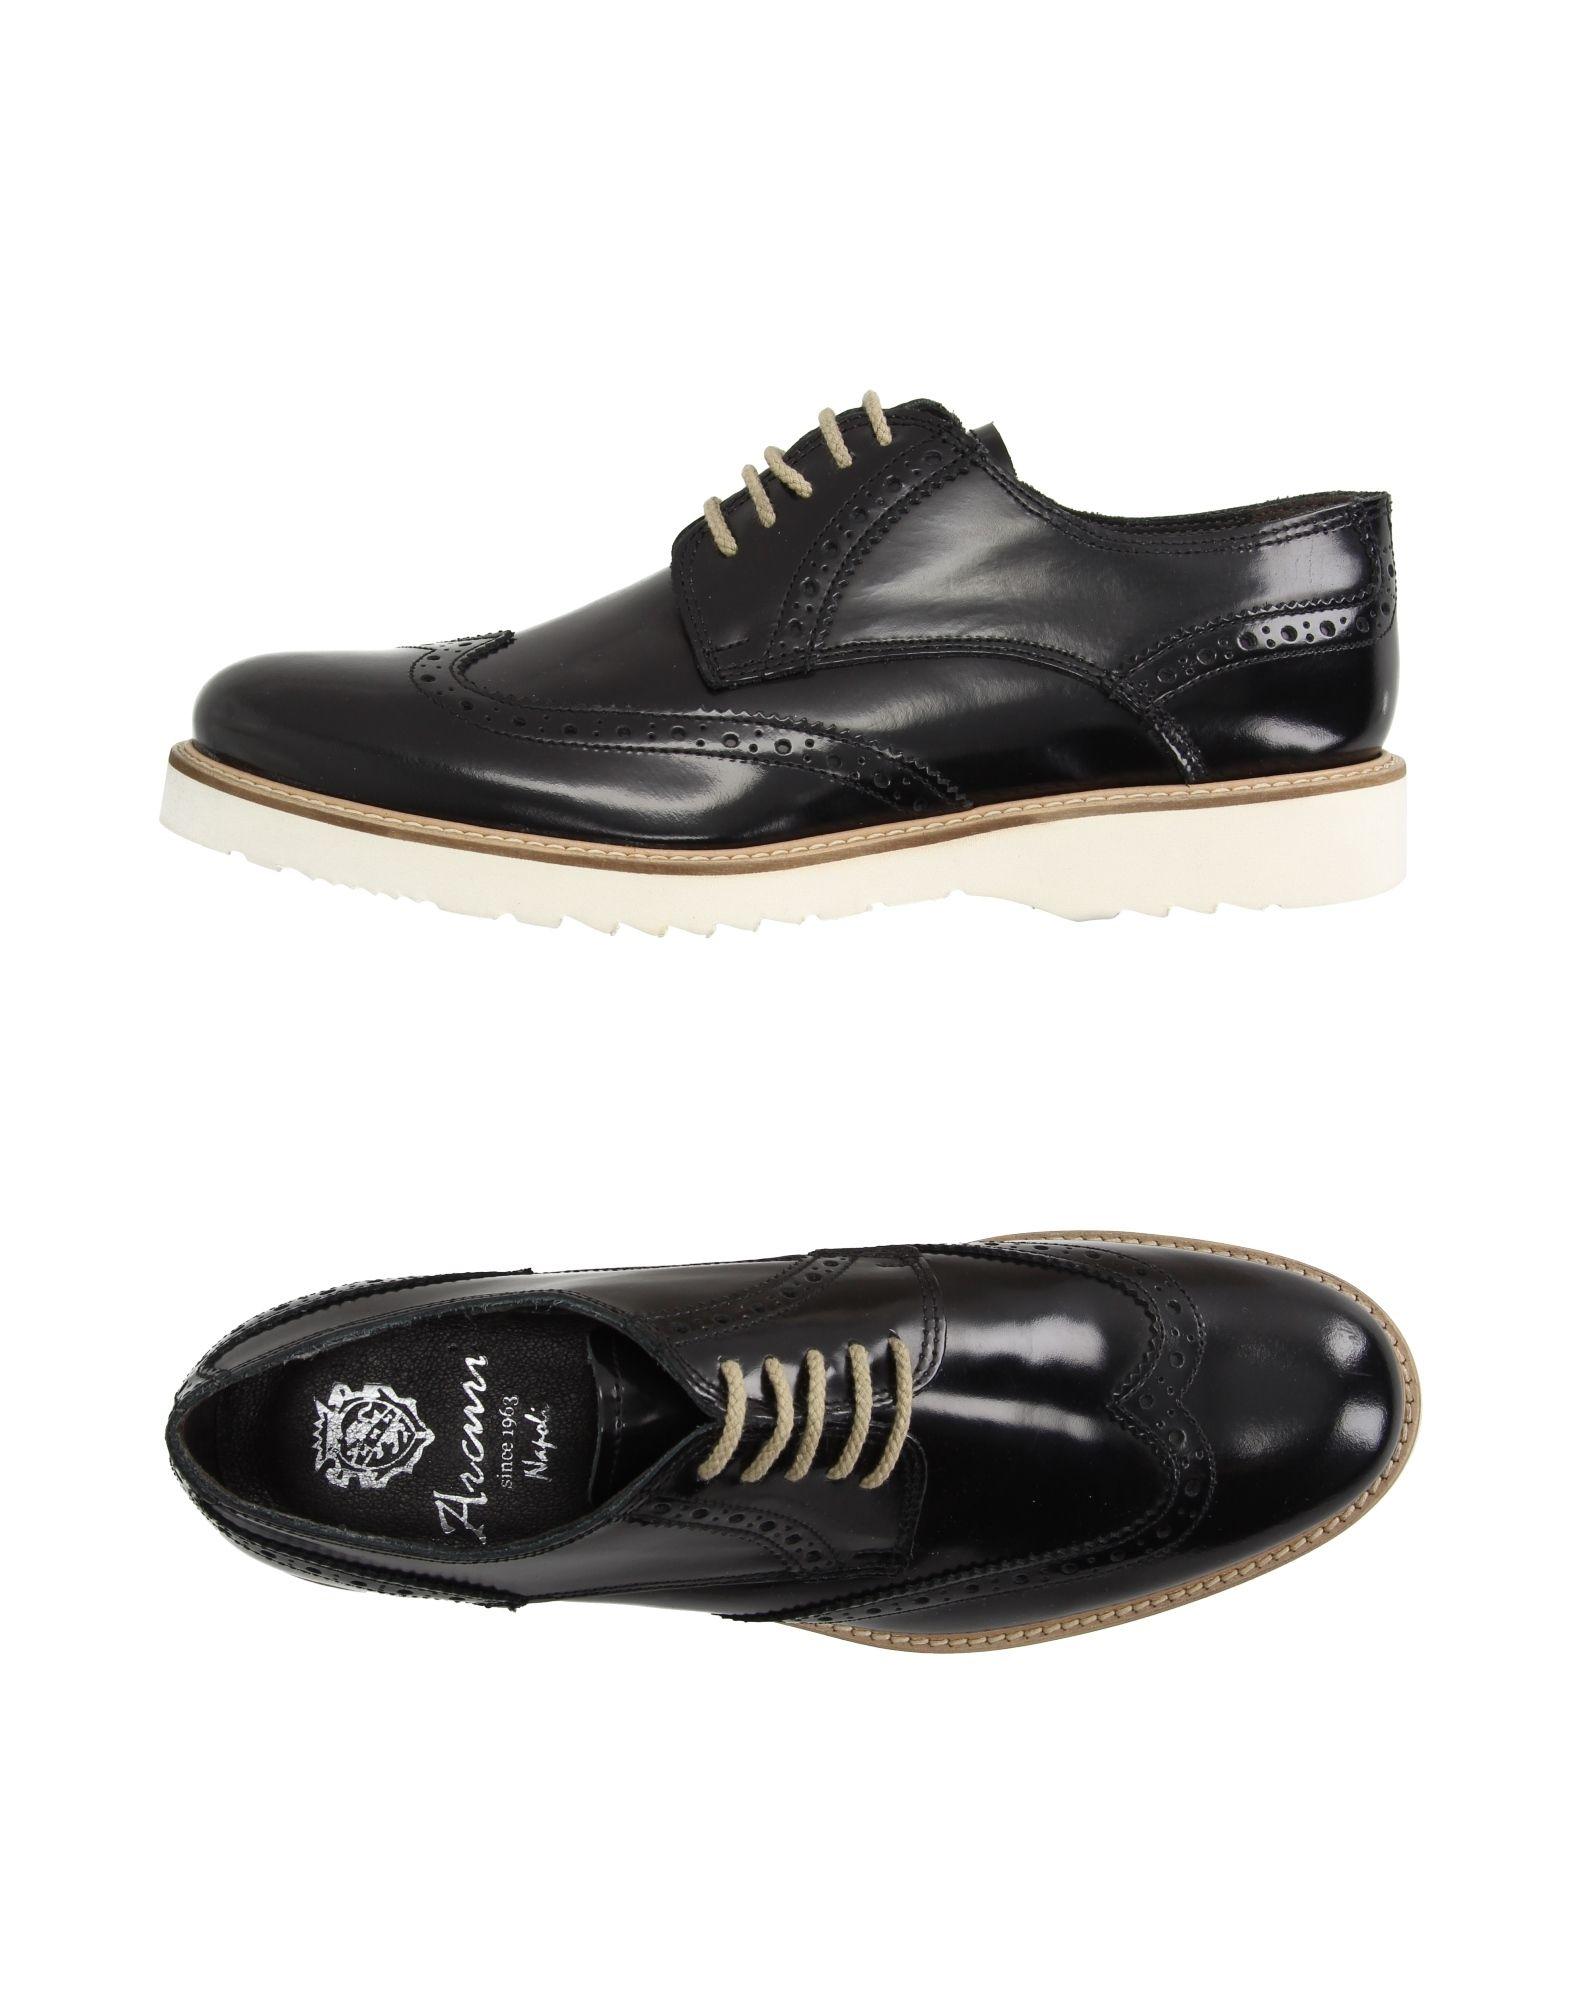 ARCURI Обувь на шнурках первый внутри обувь обувь обувь обувь обувь обувь обувь обувь обувь 8a2549 мужская армия green 40 метров